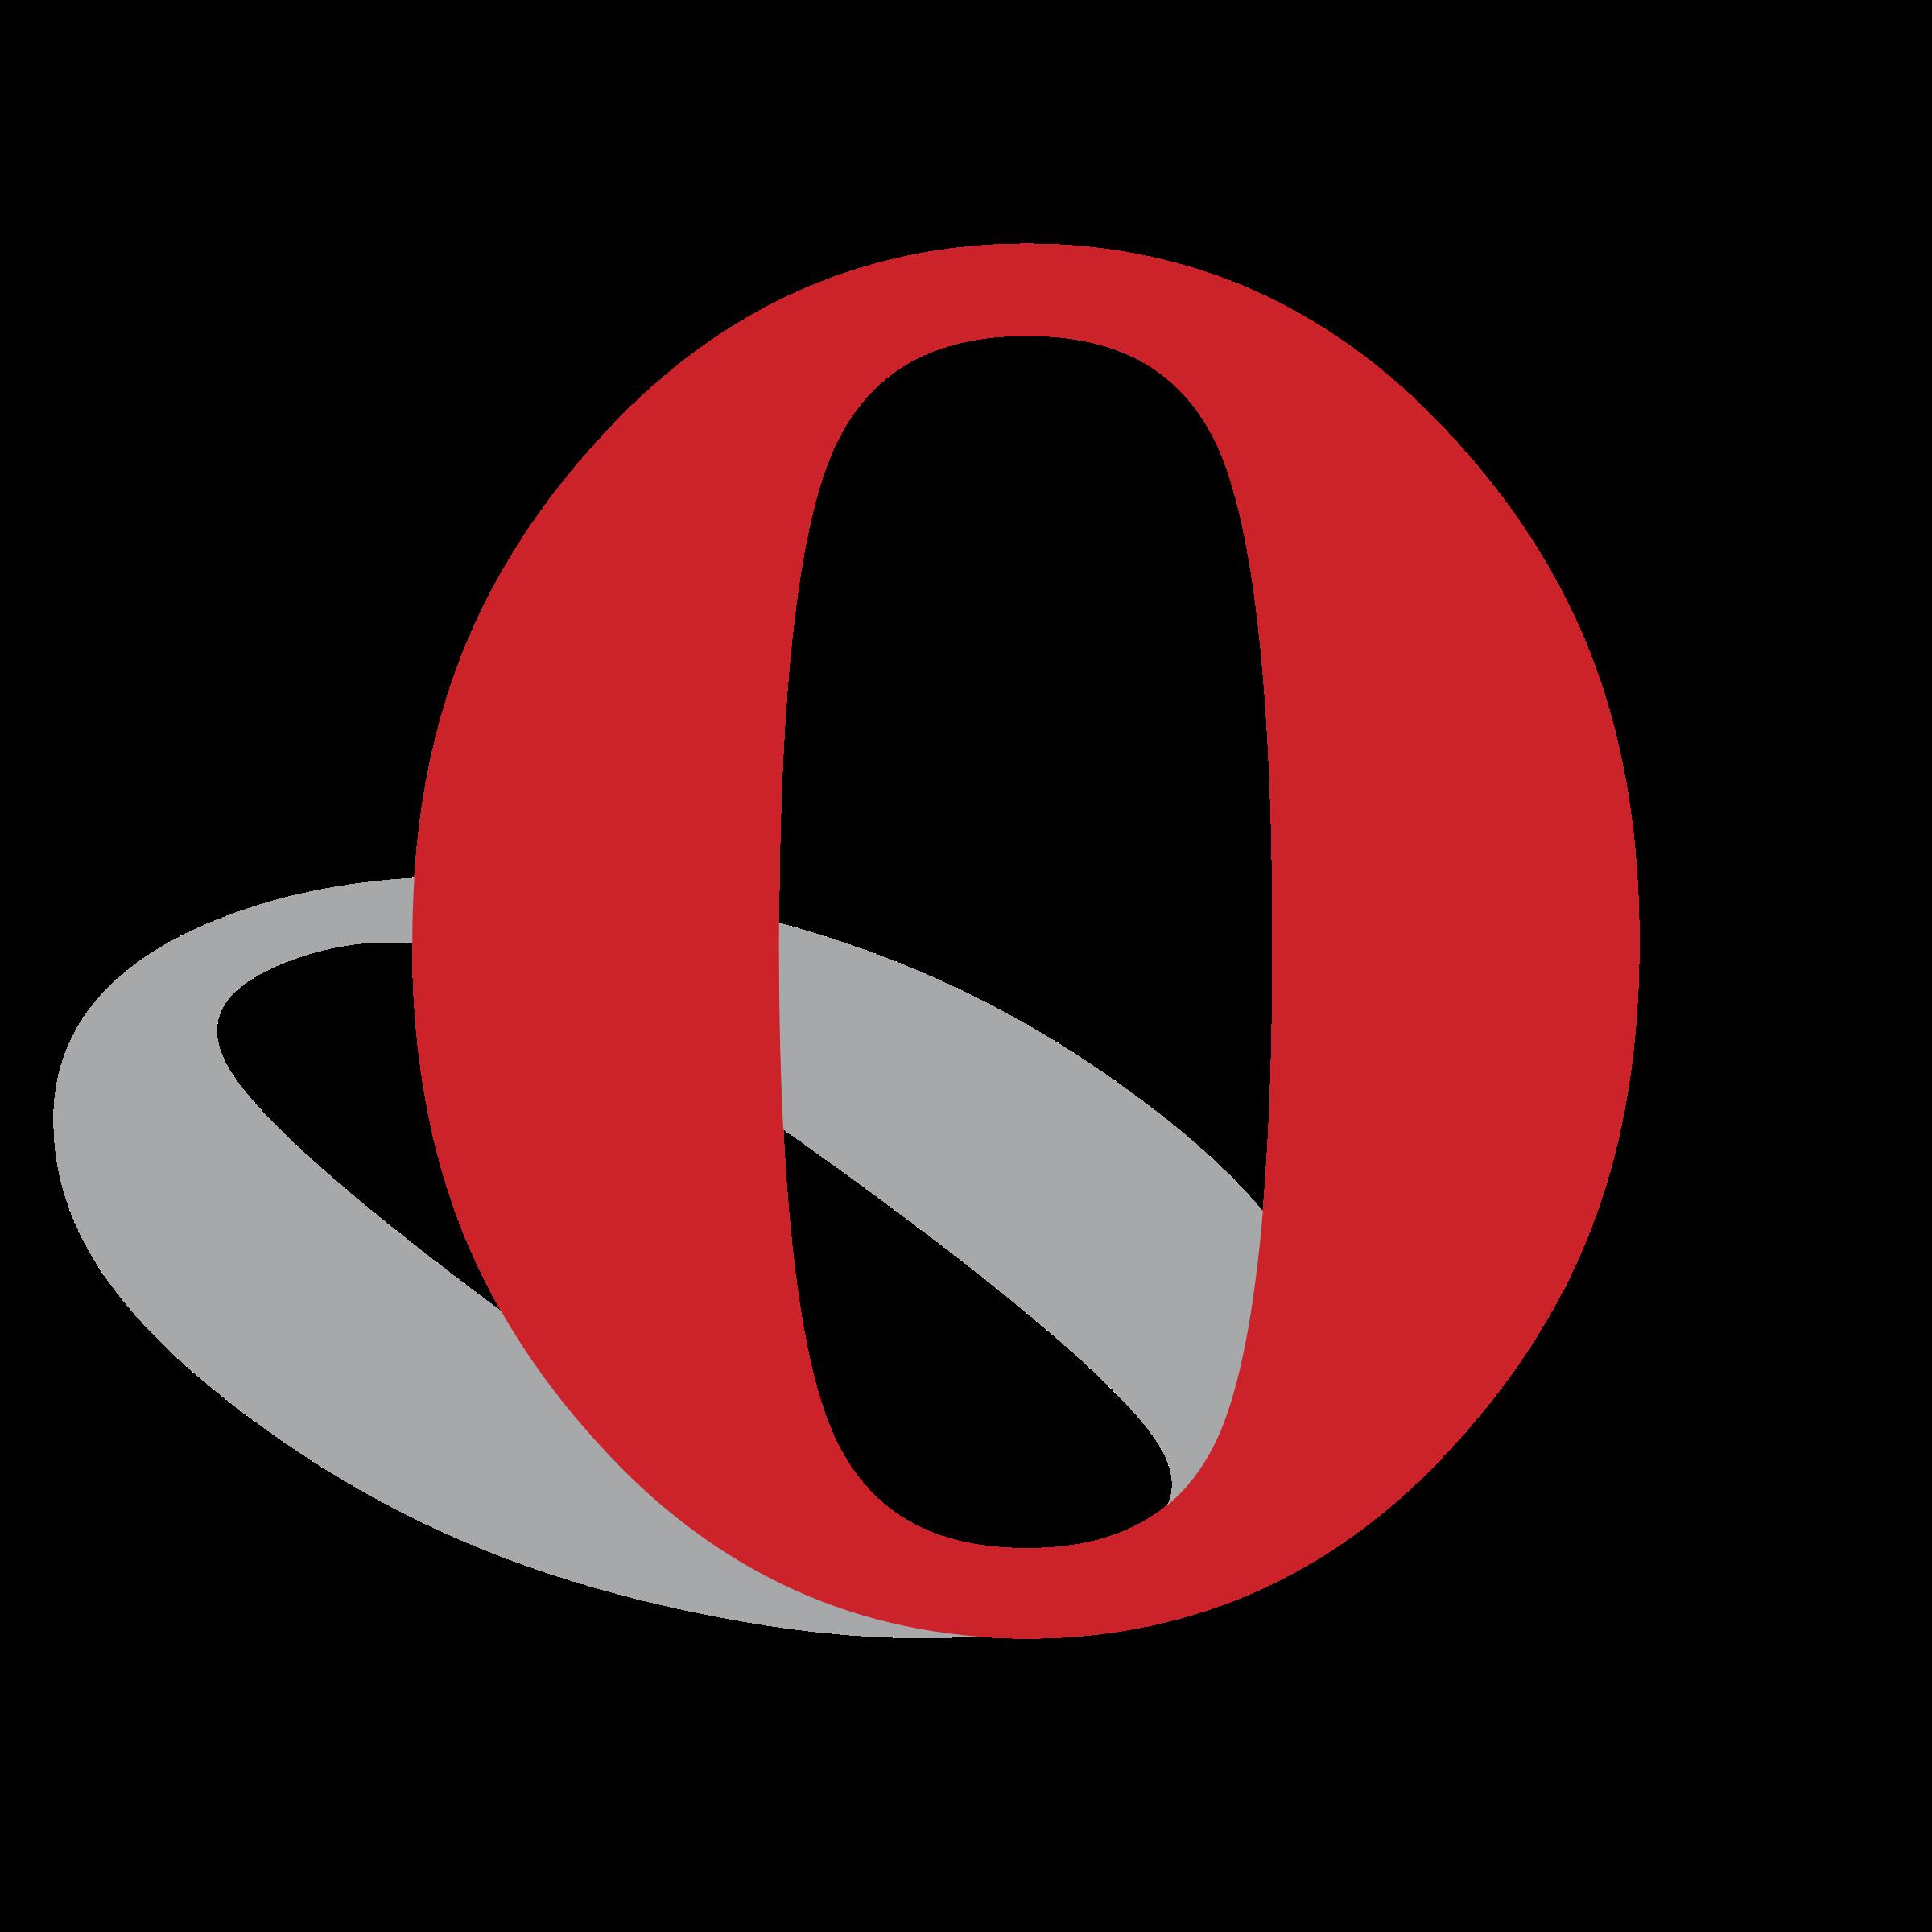 Opera Logo Png Transparent & Svg Vector - Pluspng Pluspng.com - Opera Logo PNG